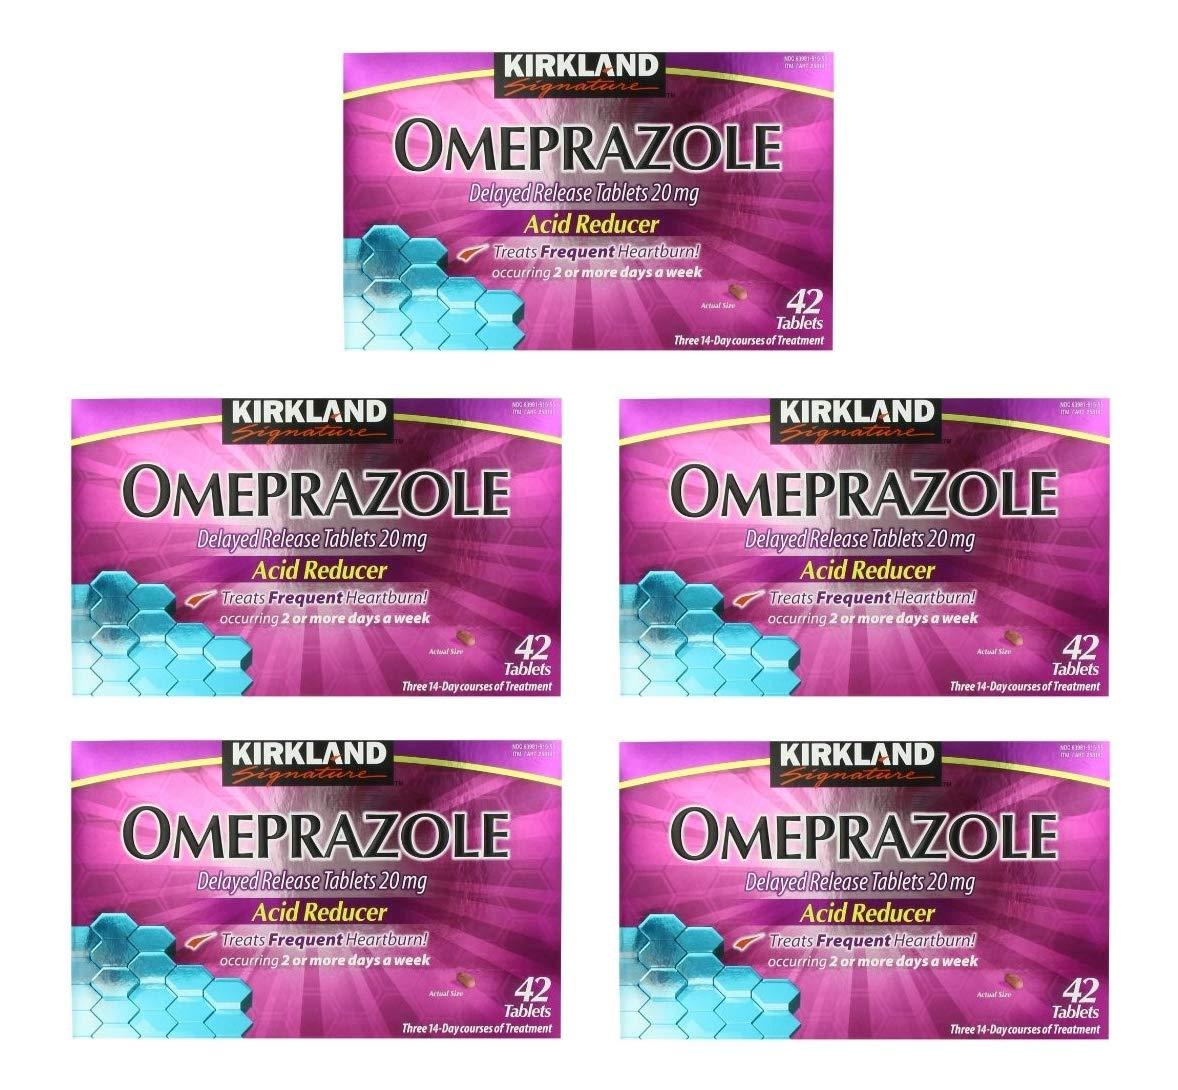 Kirkland Signature Omeprazole Delayed Release, Acid Reducer Tablets 20 mg (Pack of 5)